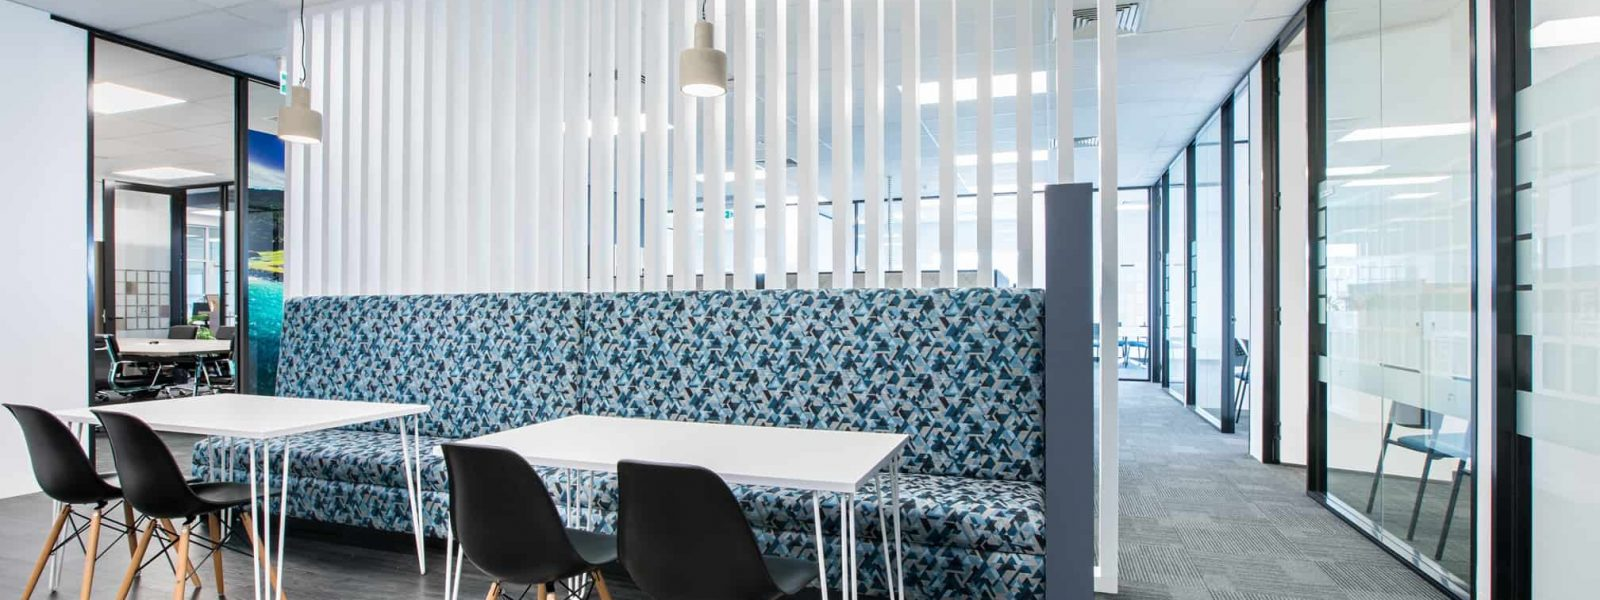 Office Fitouts Adelaide, Fulton Hogan | Contour Interiors